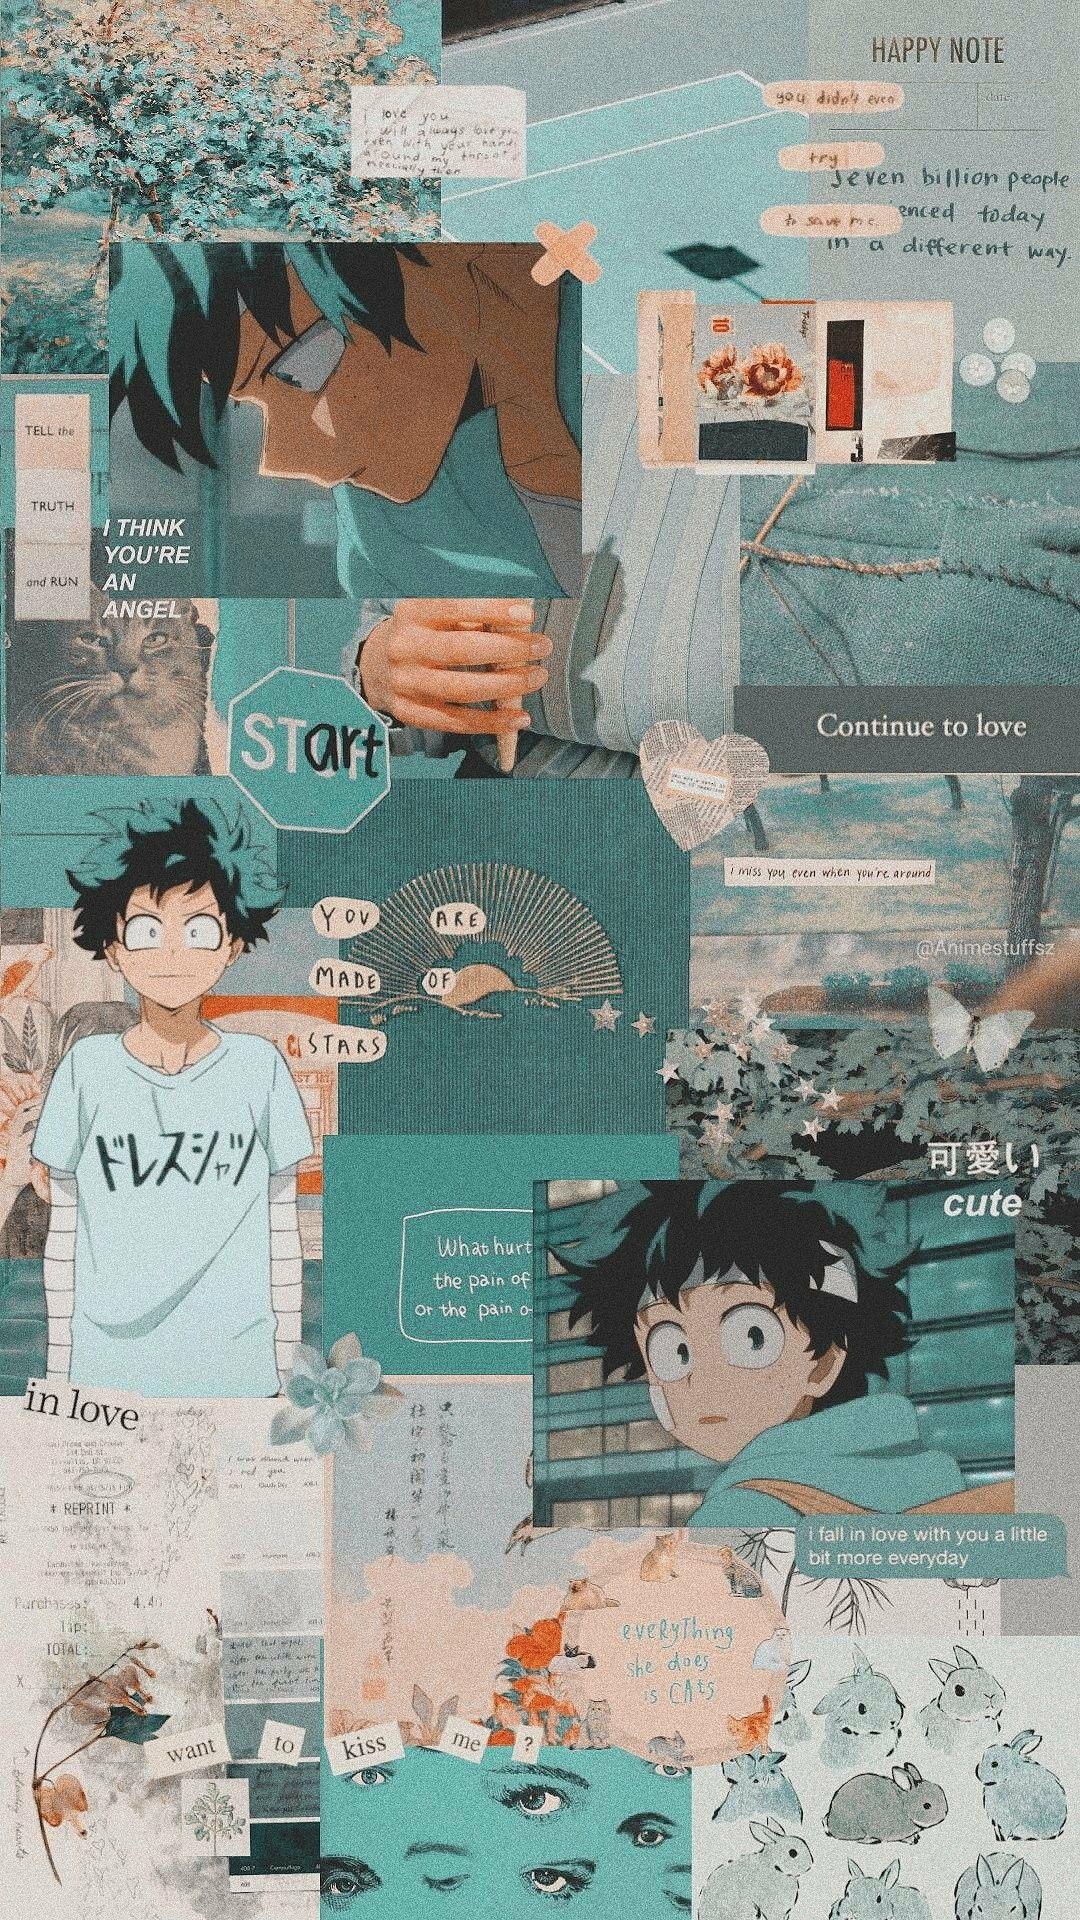 Free Download Midoriya Izuku Cute Anime Wallpaper Hero Wallpaper Cute Wallpapers 1080x1920 For Your Desktop Mobile Tablet Explore 43 Cool Deku Anime Wallpapers Cool Deku Anime Wallpapers Cool Anime